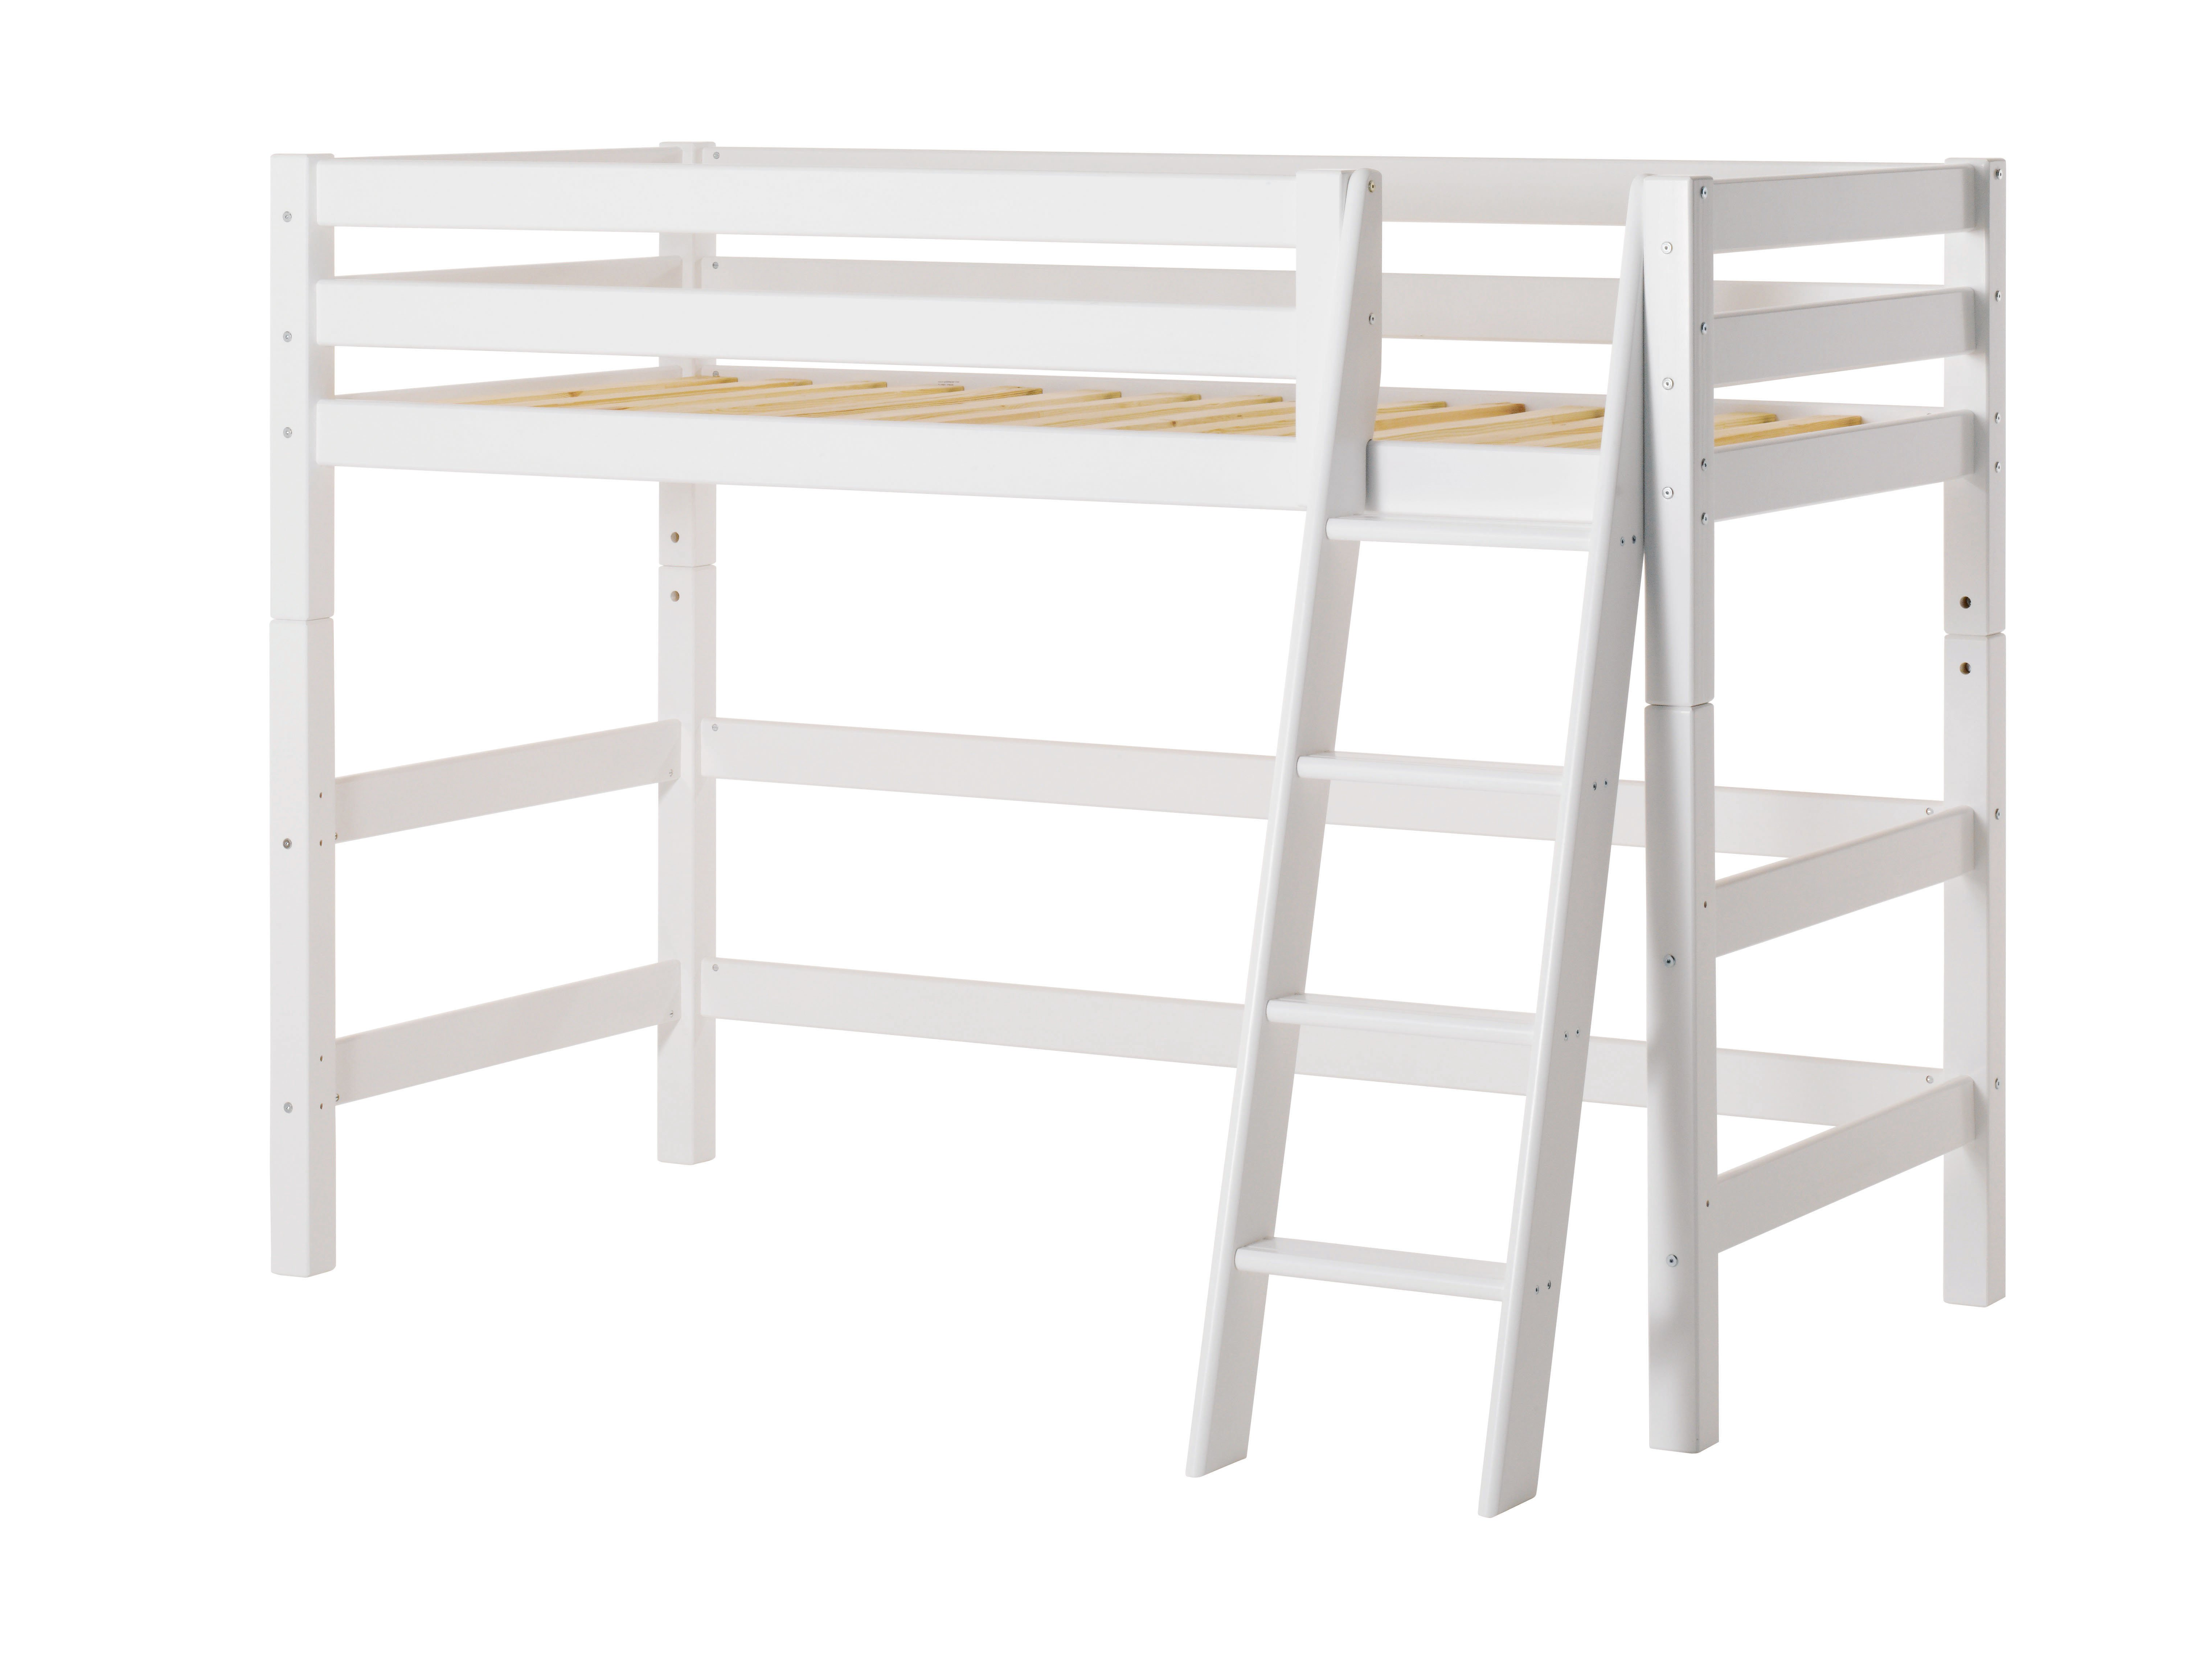 Hoppekids - PREMIUM Mid-high Bed 90x200 with Slant Ladder